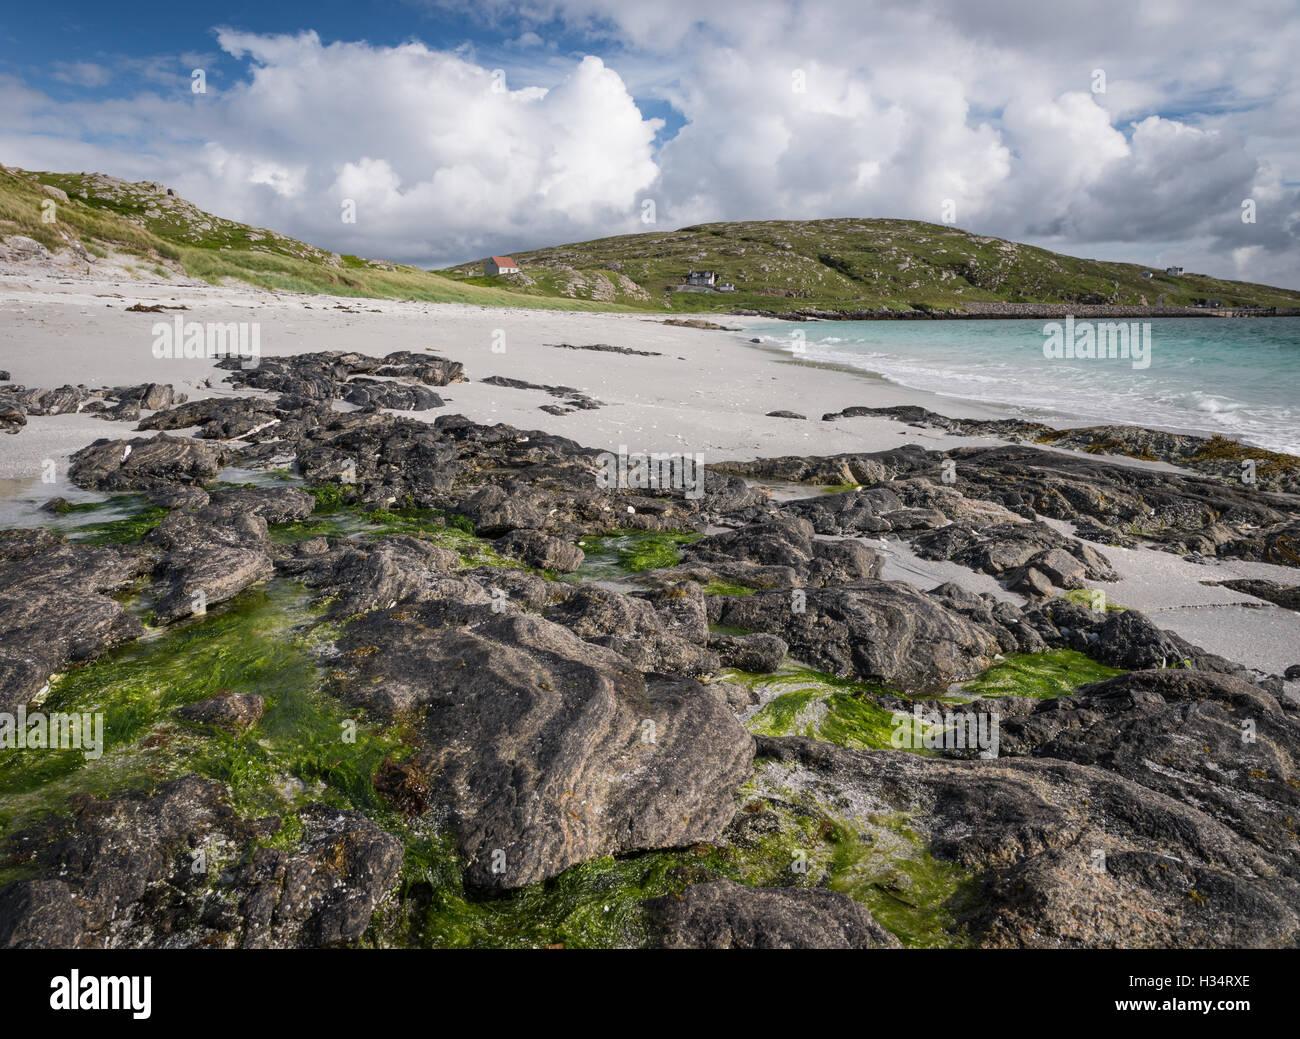 Beach on the island of Eriskay, Outer Hebrides, Western Isles, Scotland - Stock Image